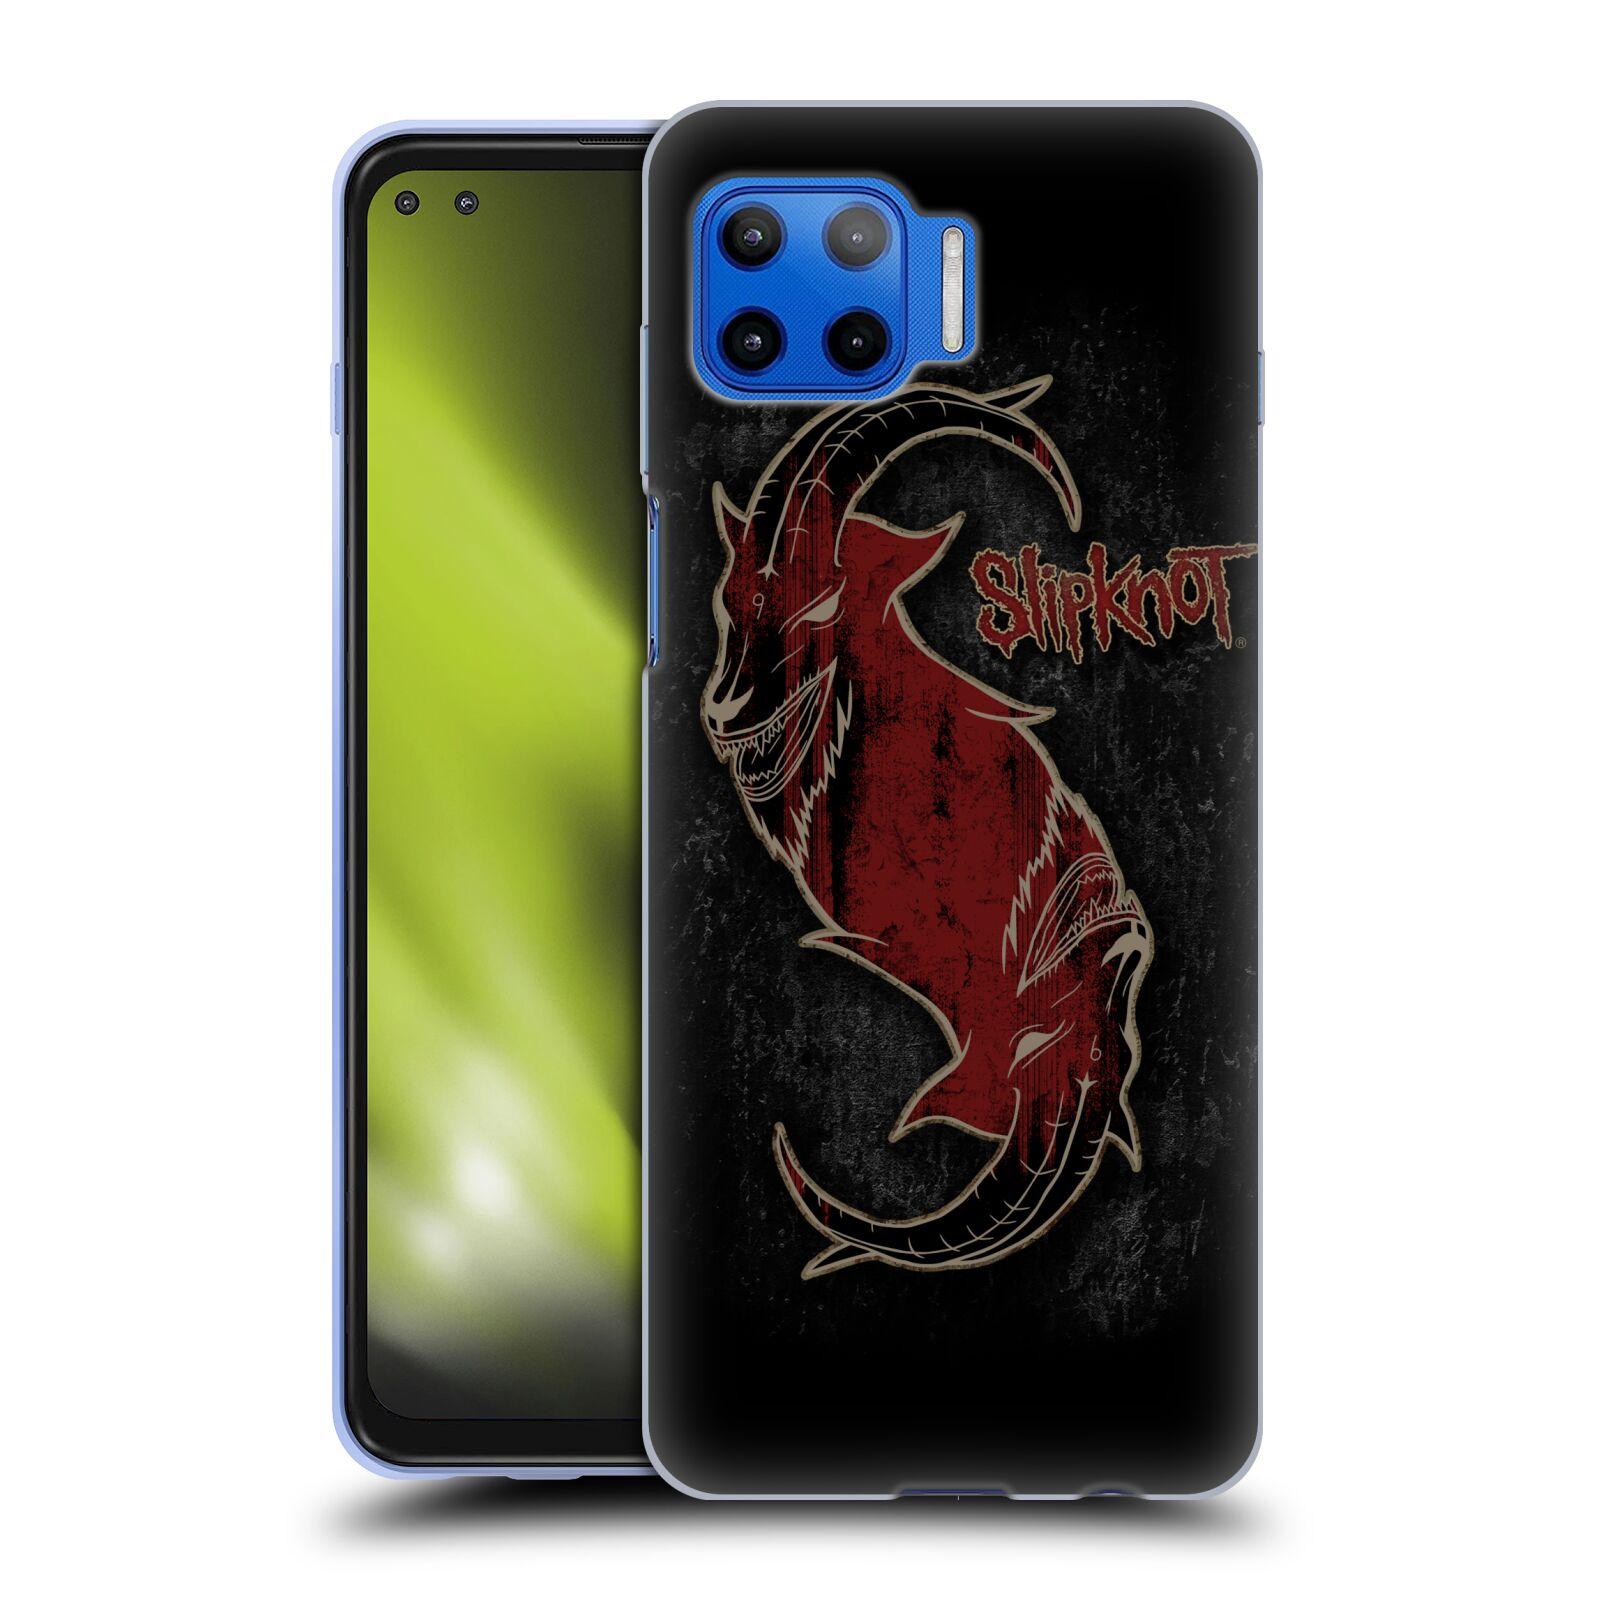 Silikonové pouzdro na mobil Motorola Moto G 5G Plus - Head Case - Slipknot - Rudý kozel